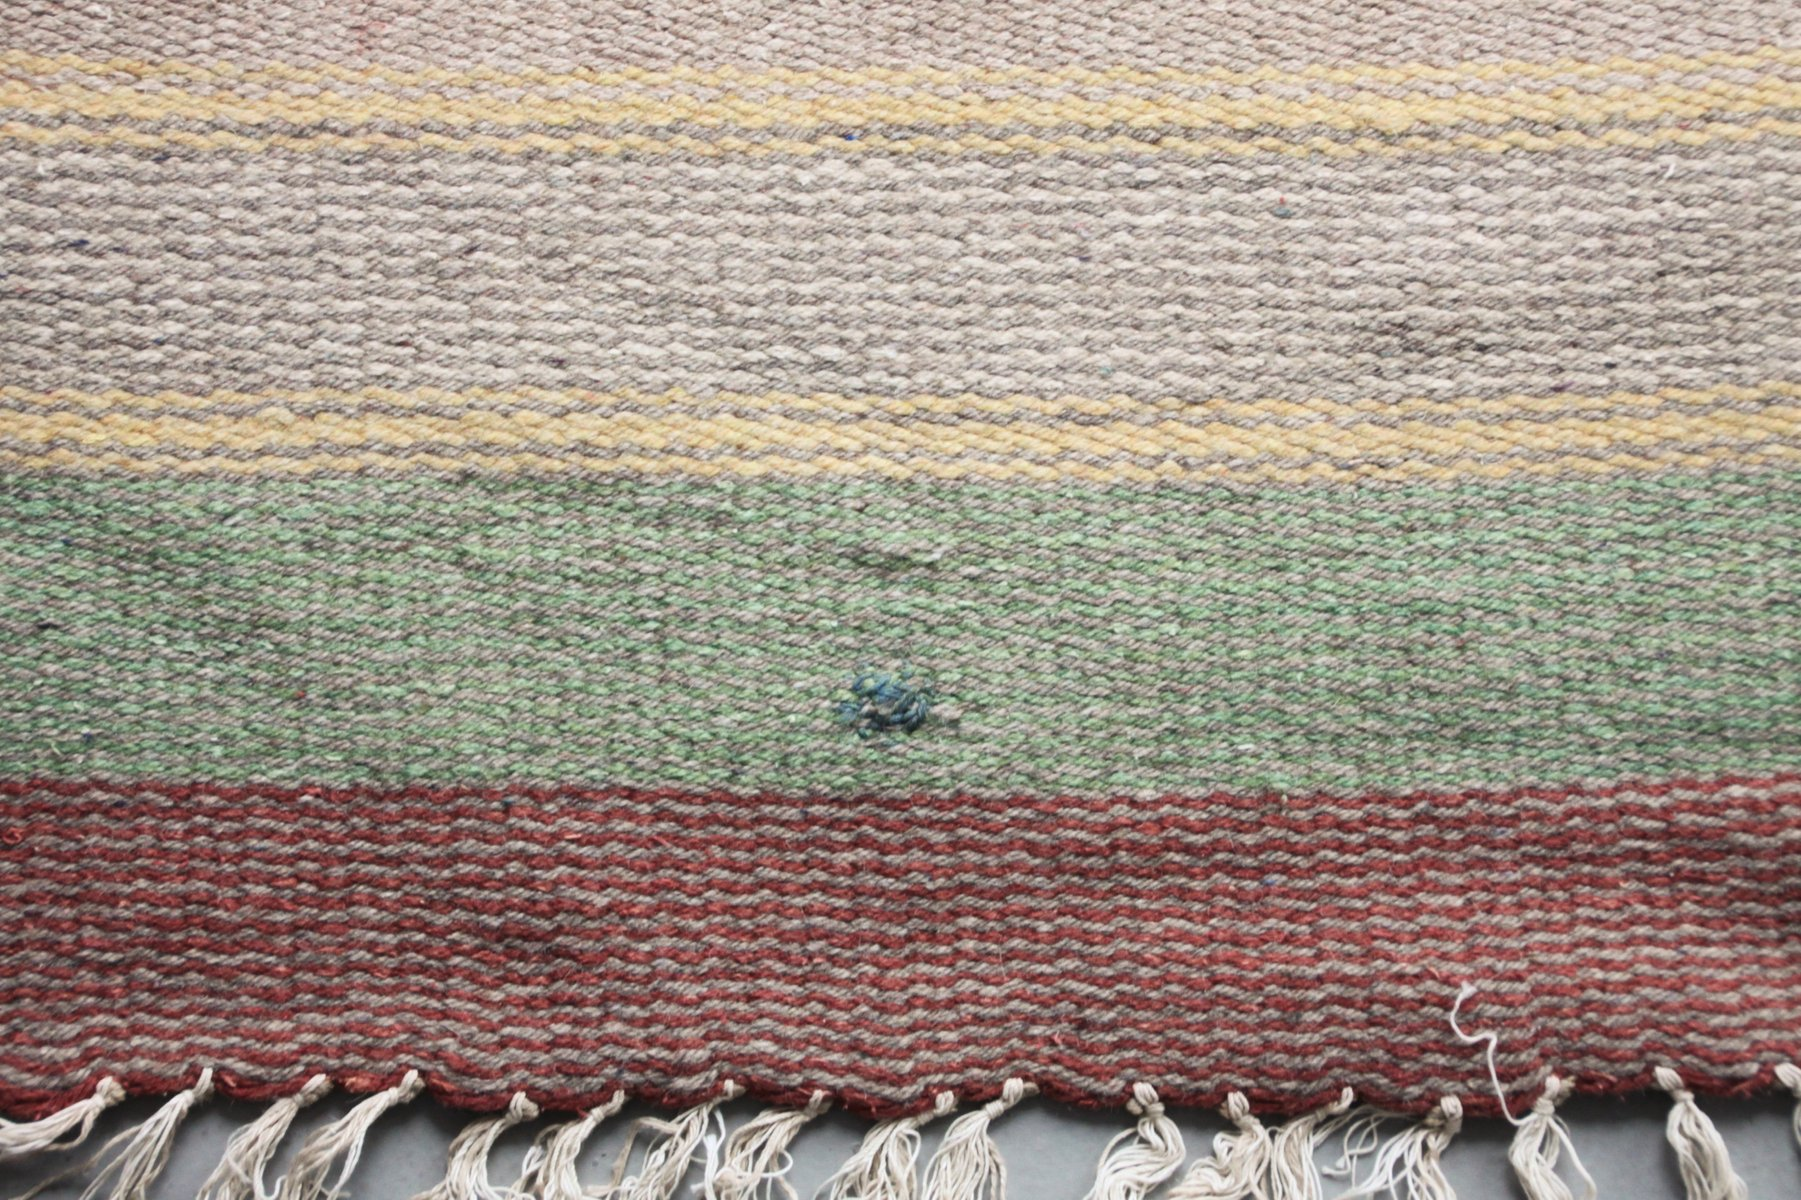 finnischer flachgewebe art deco teppich 1930er bei pamono. Black Bedroom Furniture Sets. Home Design Ideas